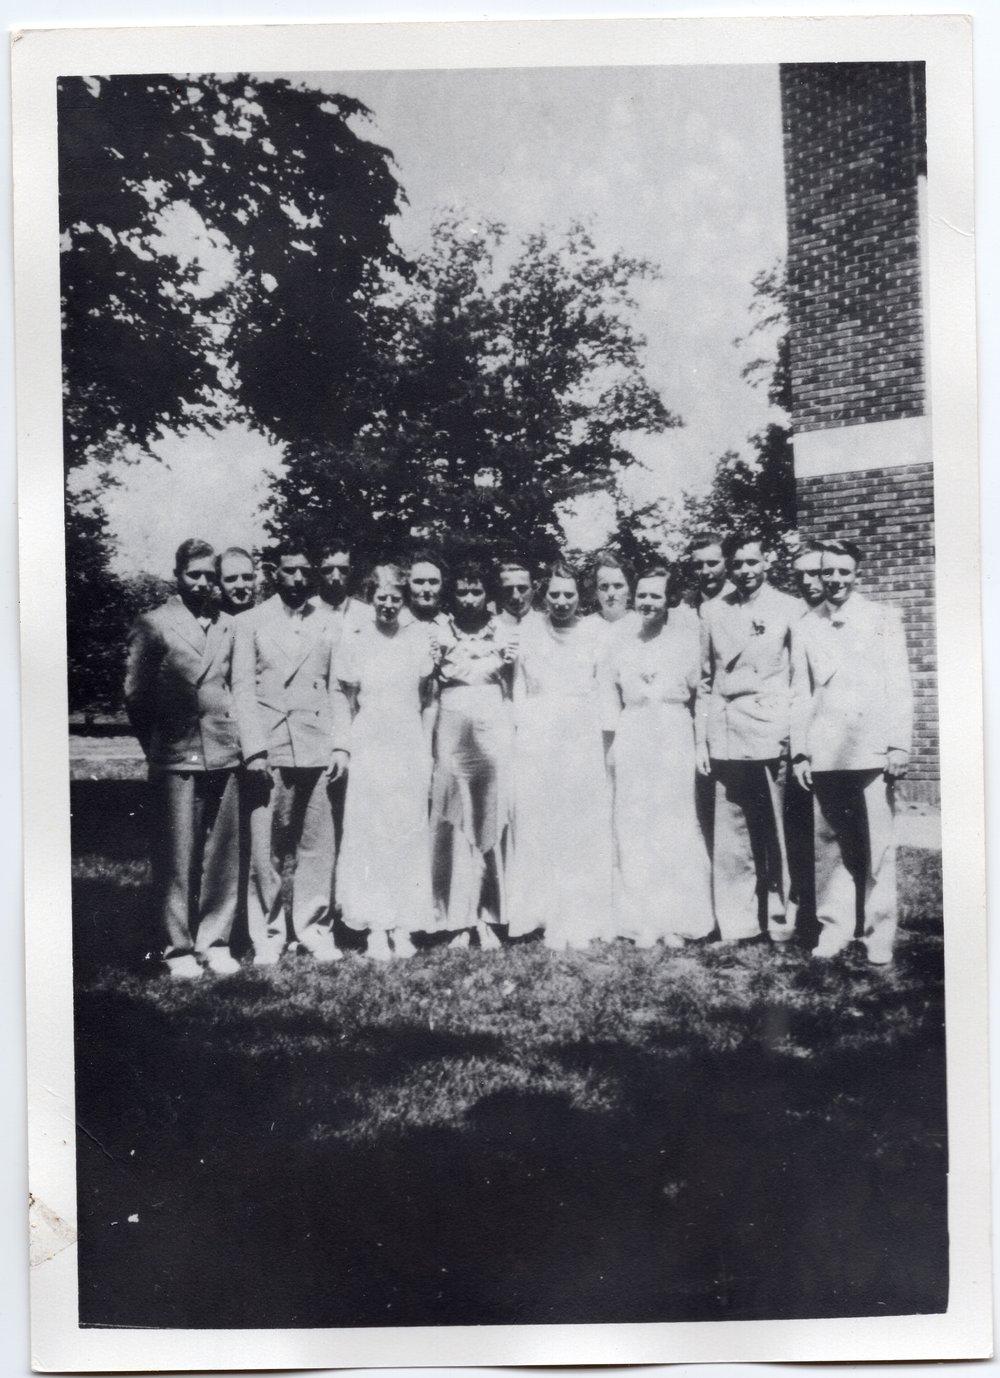 1936 Senior Class of Lecompton Rural High School, Lecompton, Kansas - front